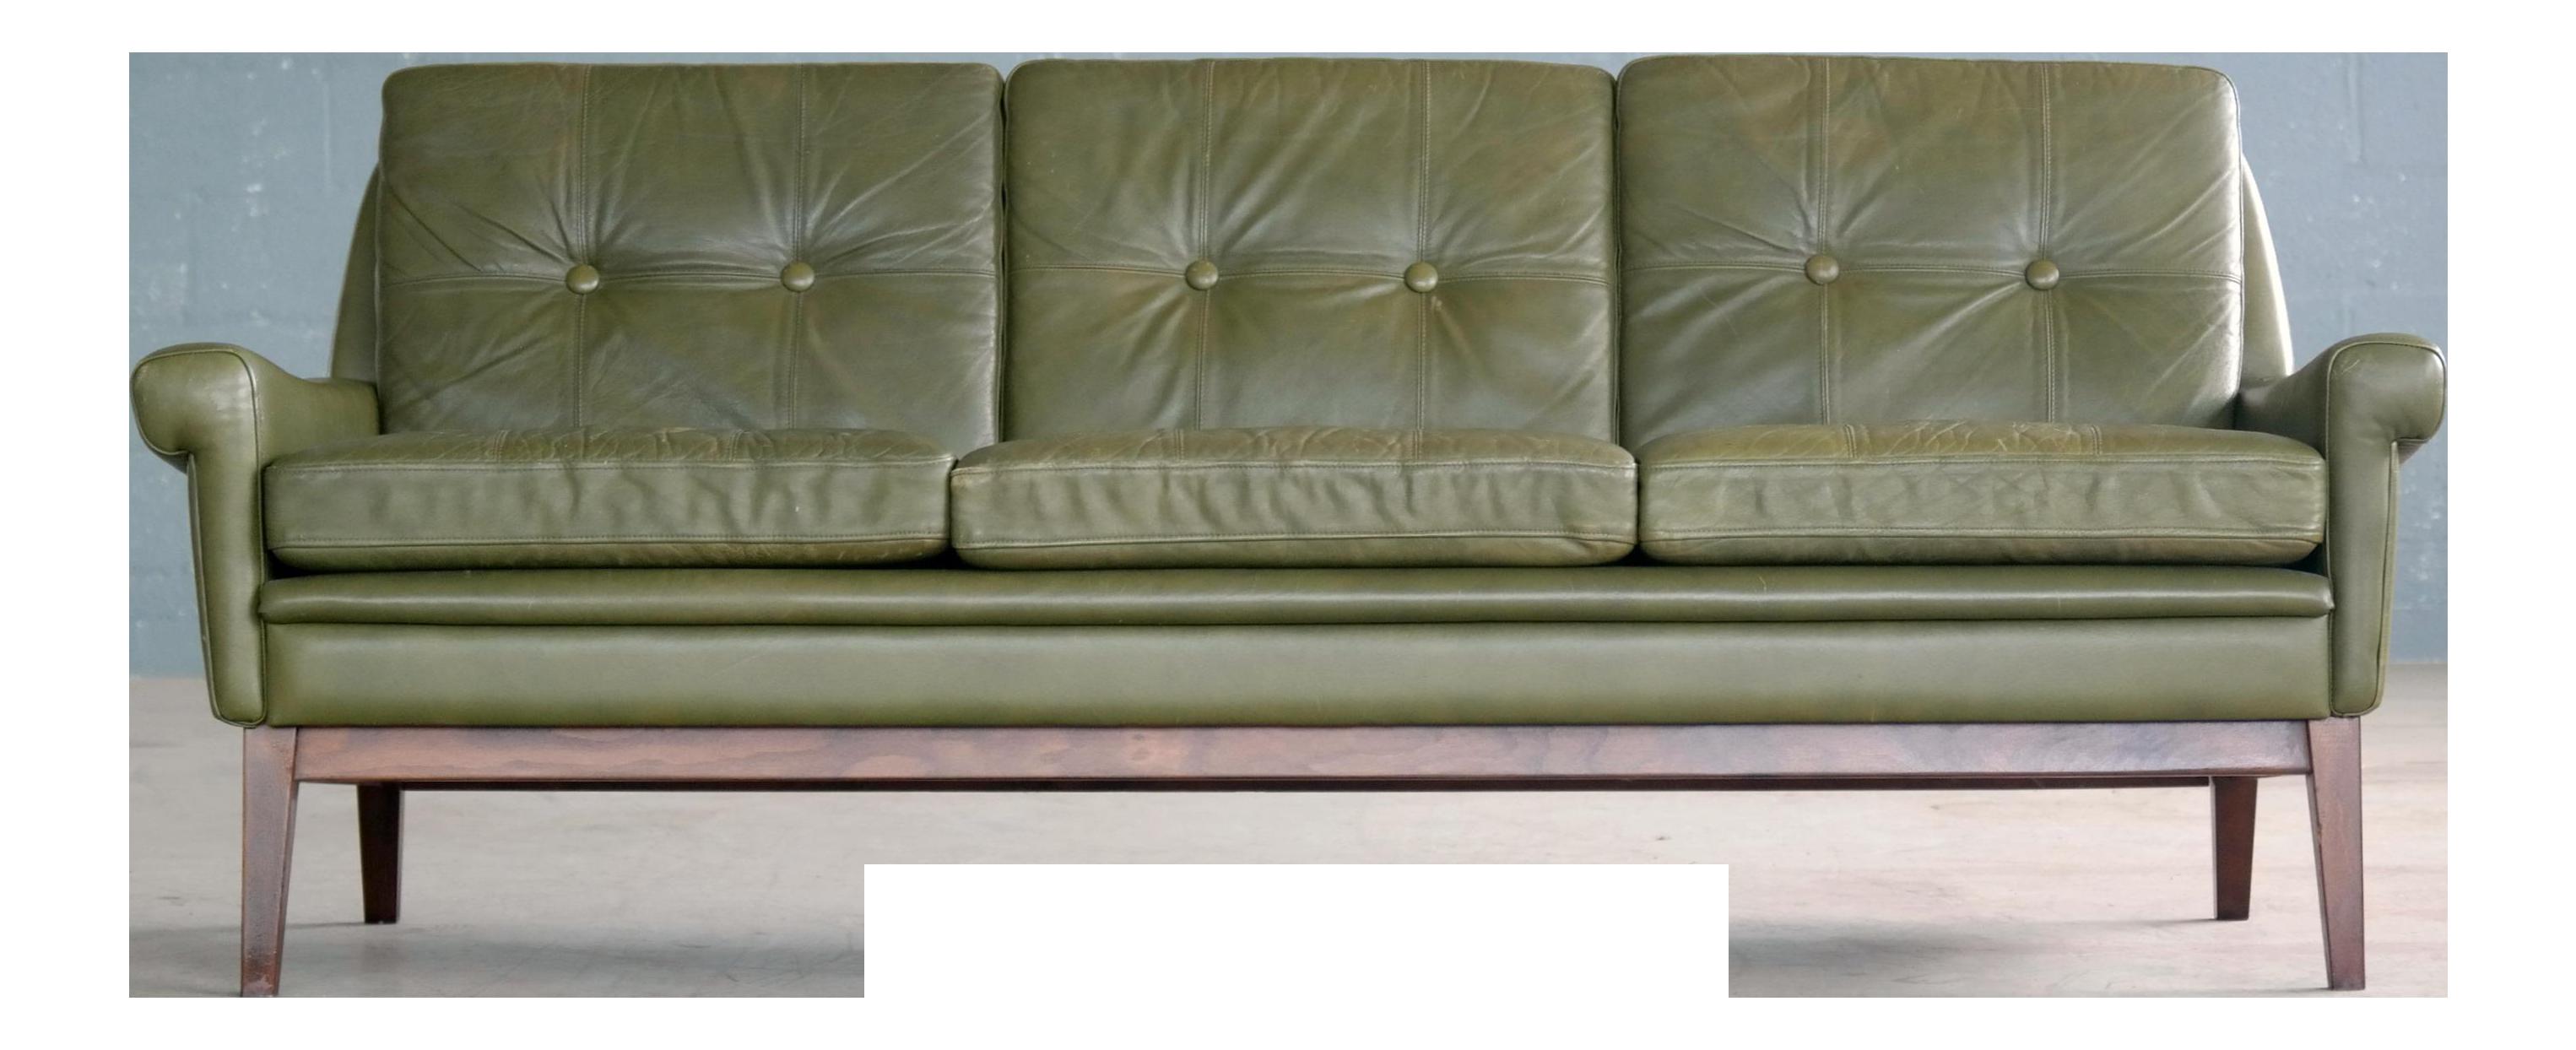 Svend Skipper Three Seat Sofa In Green Leather, Denmark, 1960s